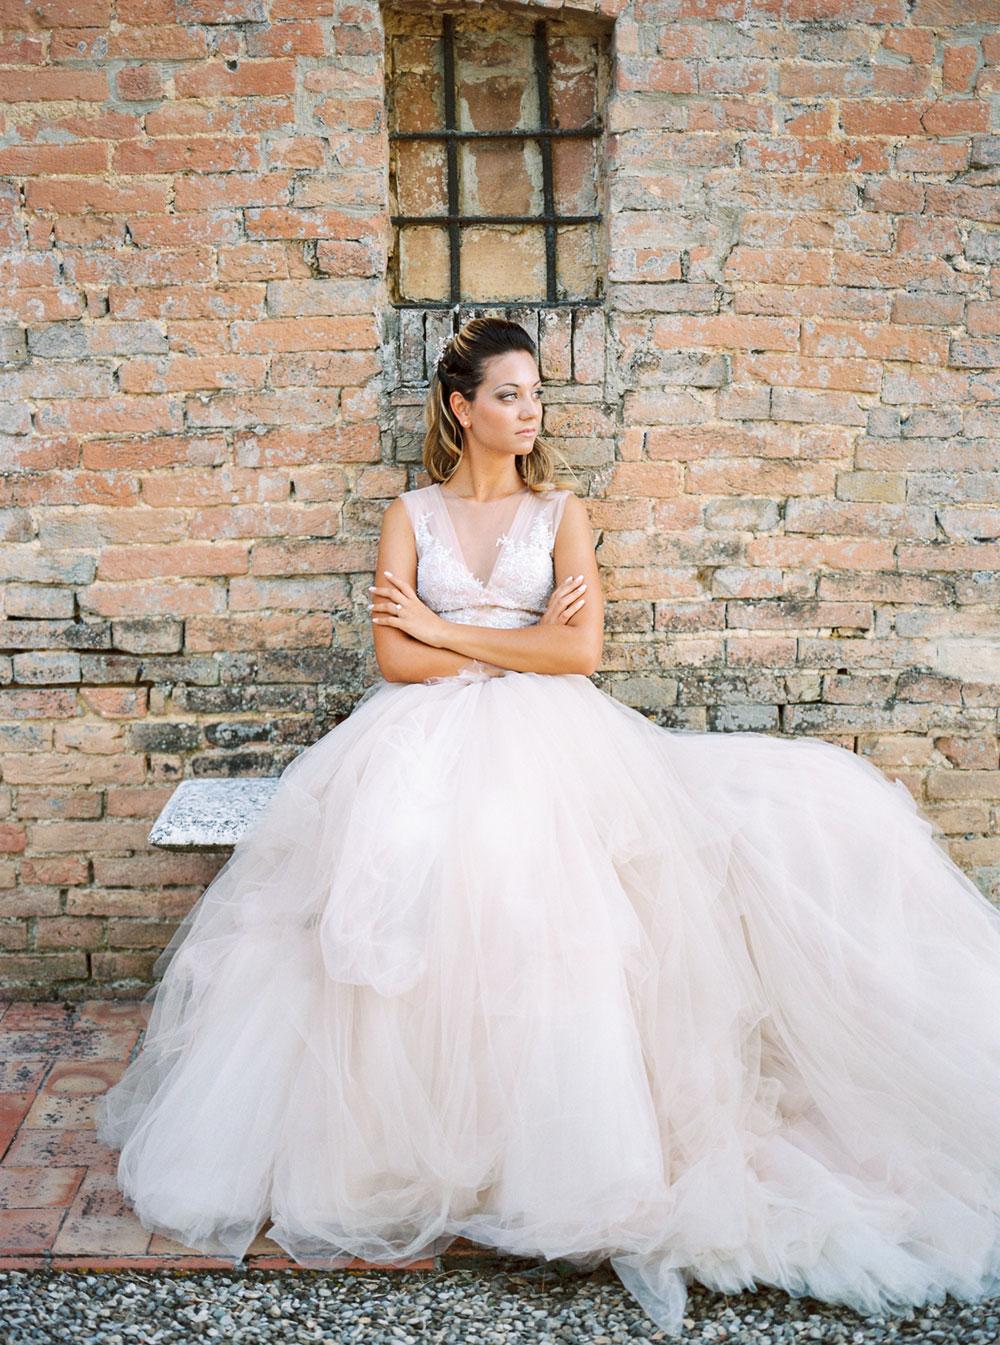 Linari-Tuscany-Elopement-Courtney-Michaela-107